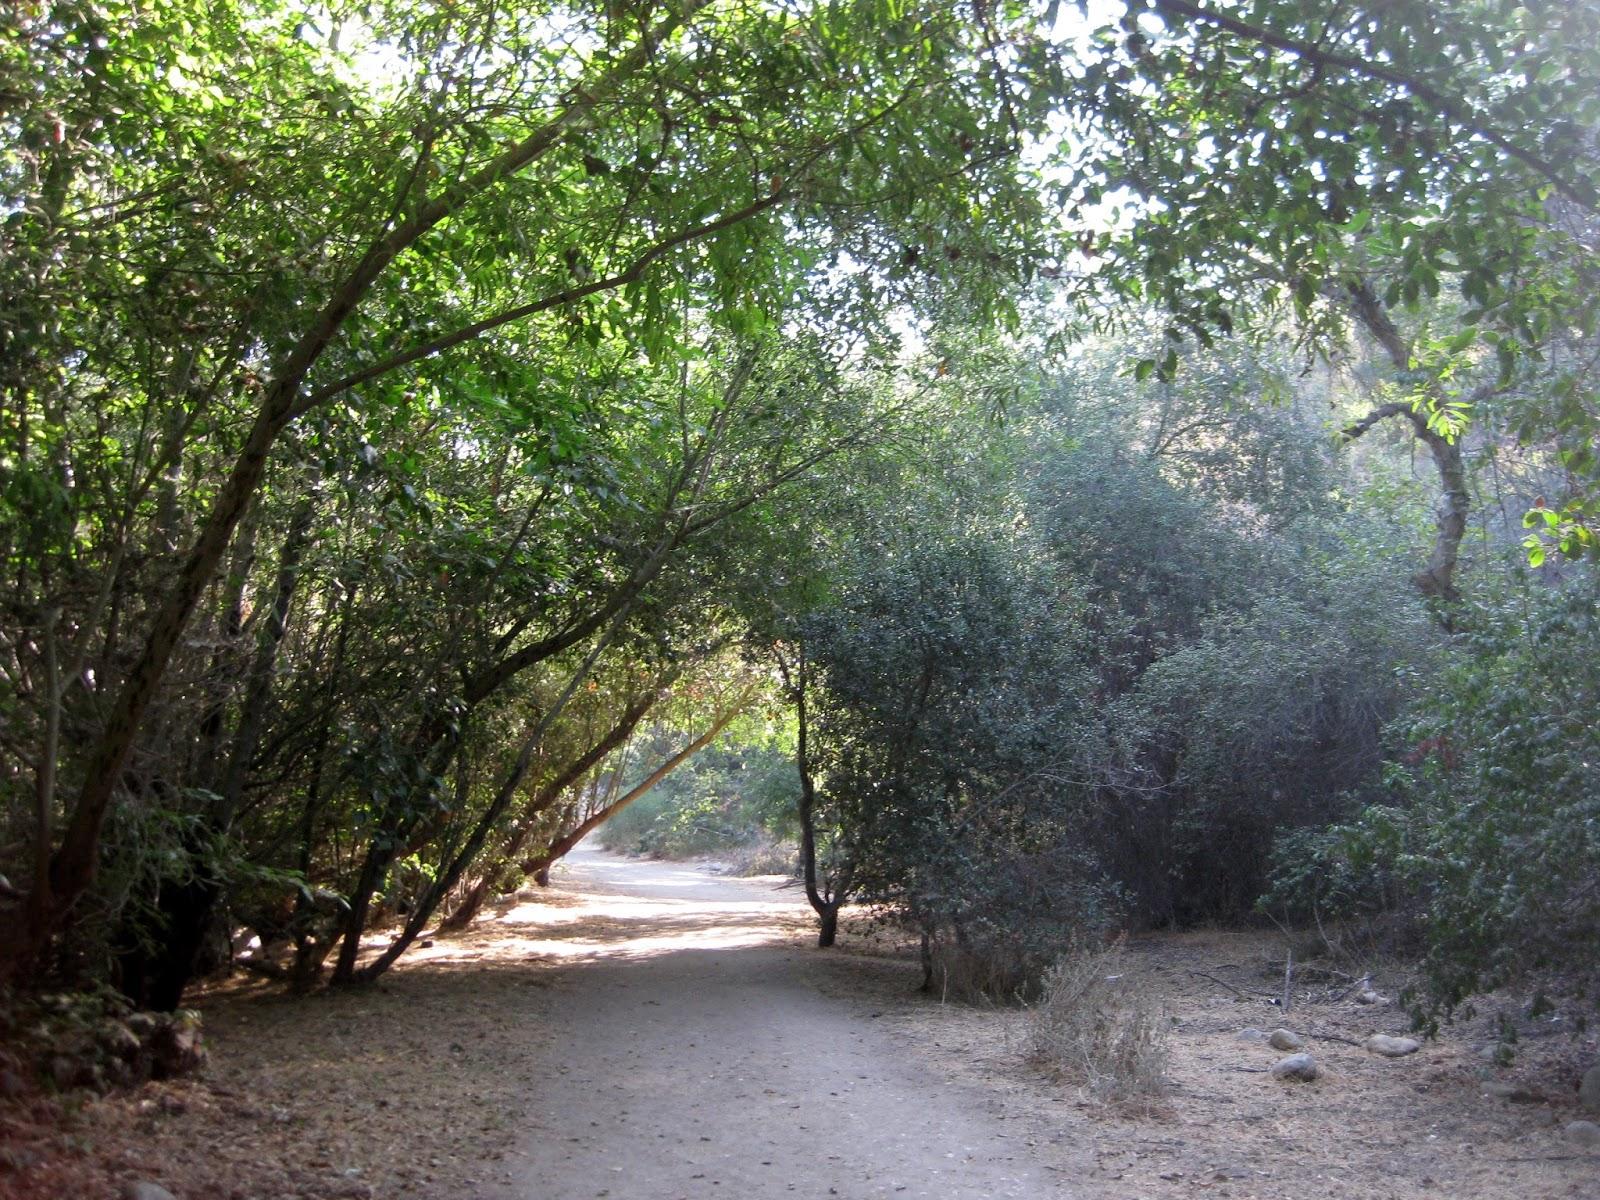 Trail Run LA: Arroyo Seco Trail - Linking South Pas to